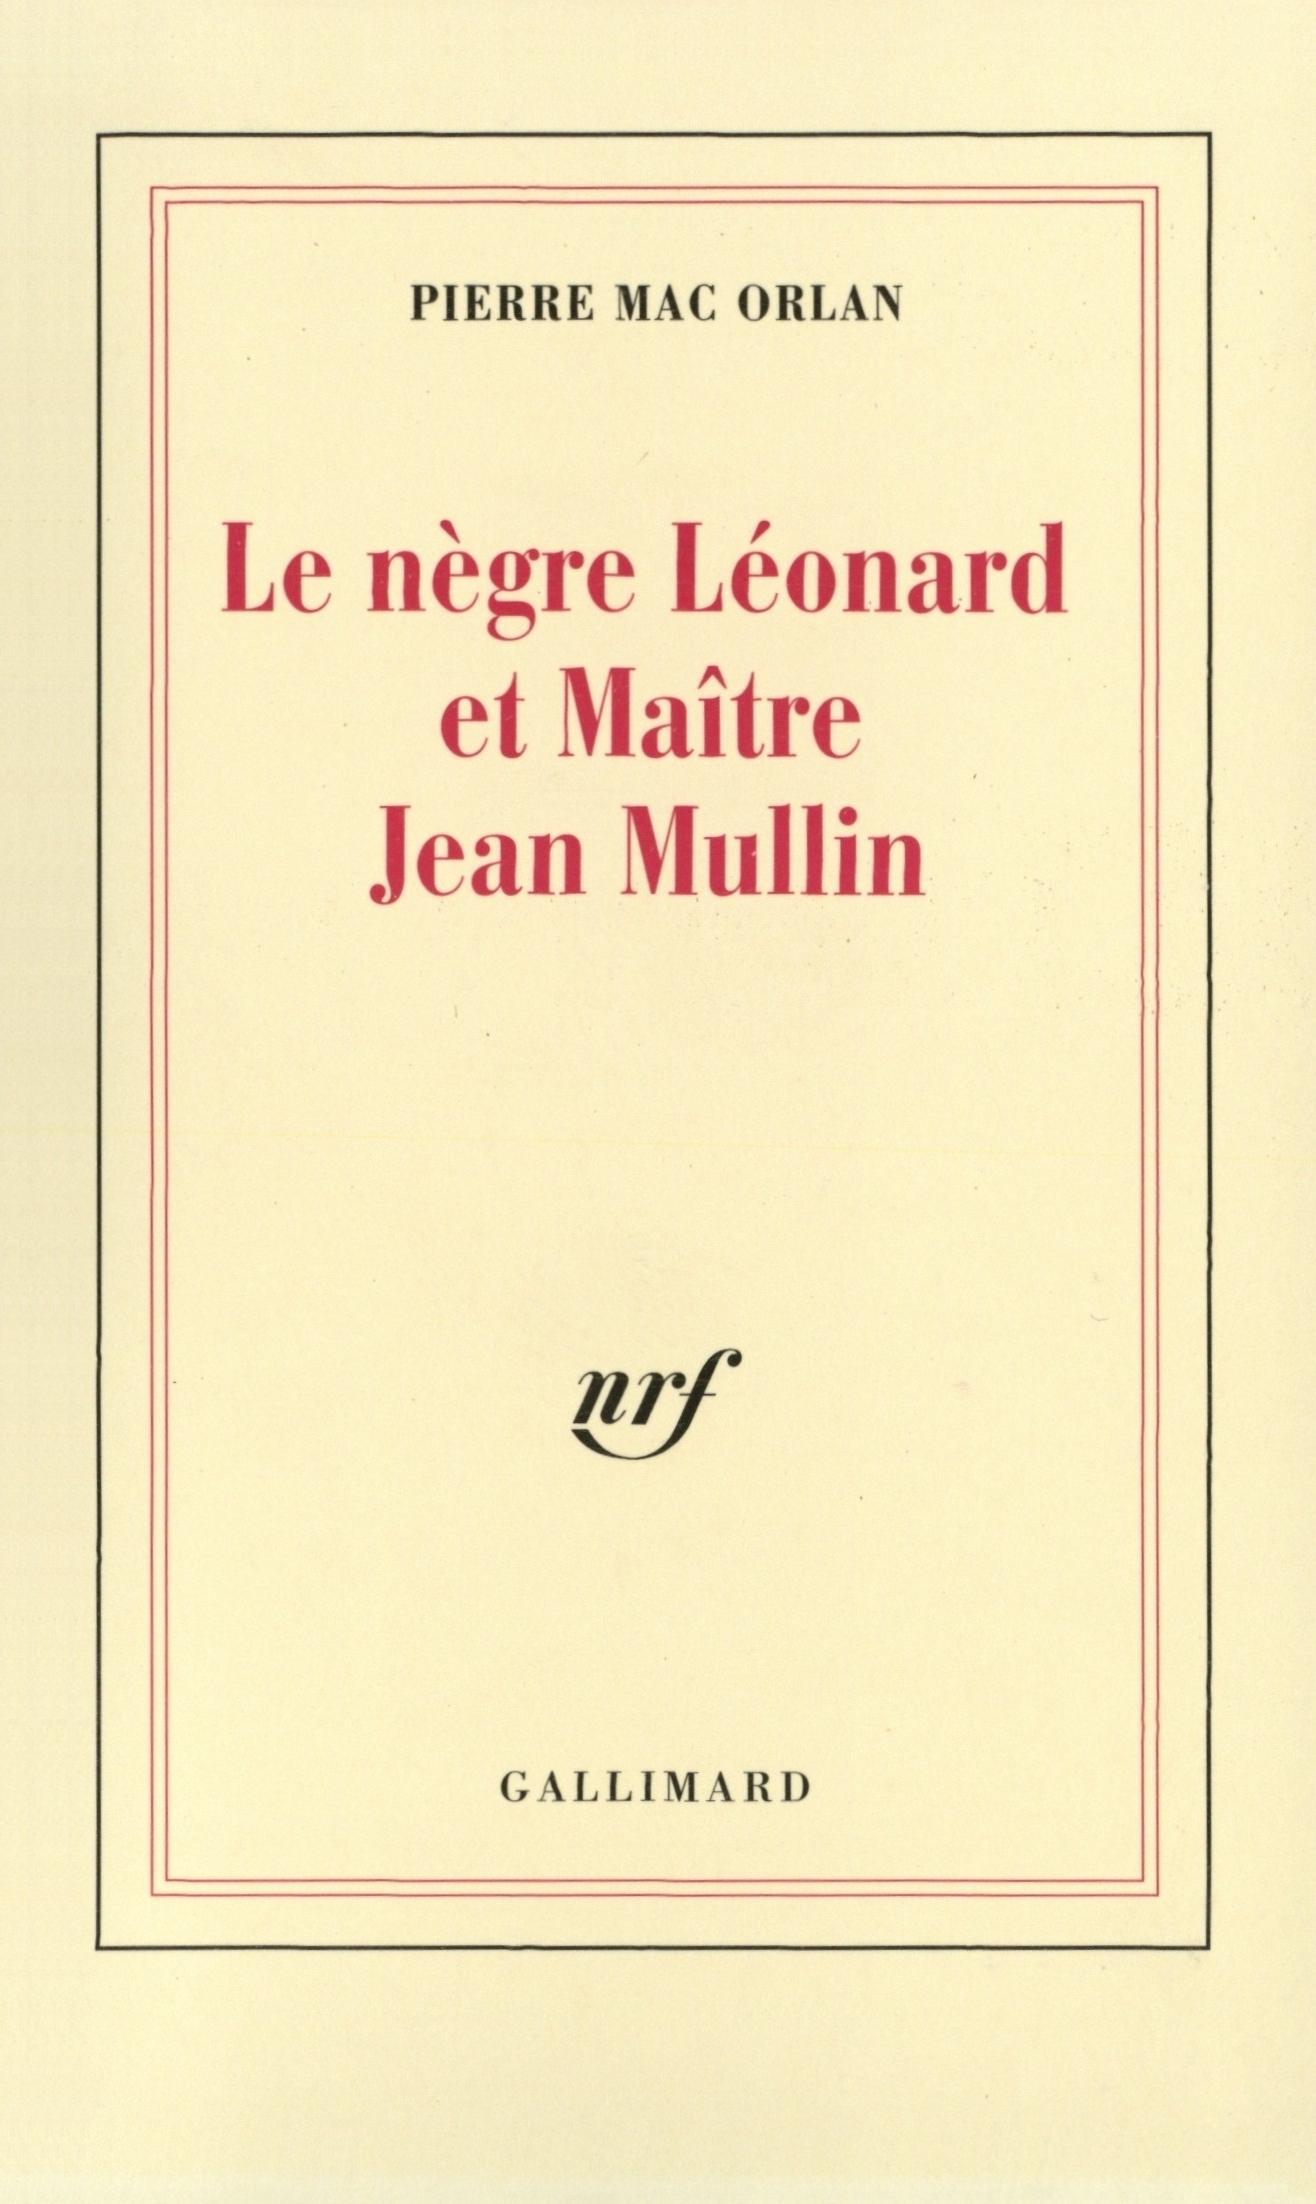 LE NEGRE LEONARD ET MAITRE JEAN MULLIN